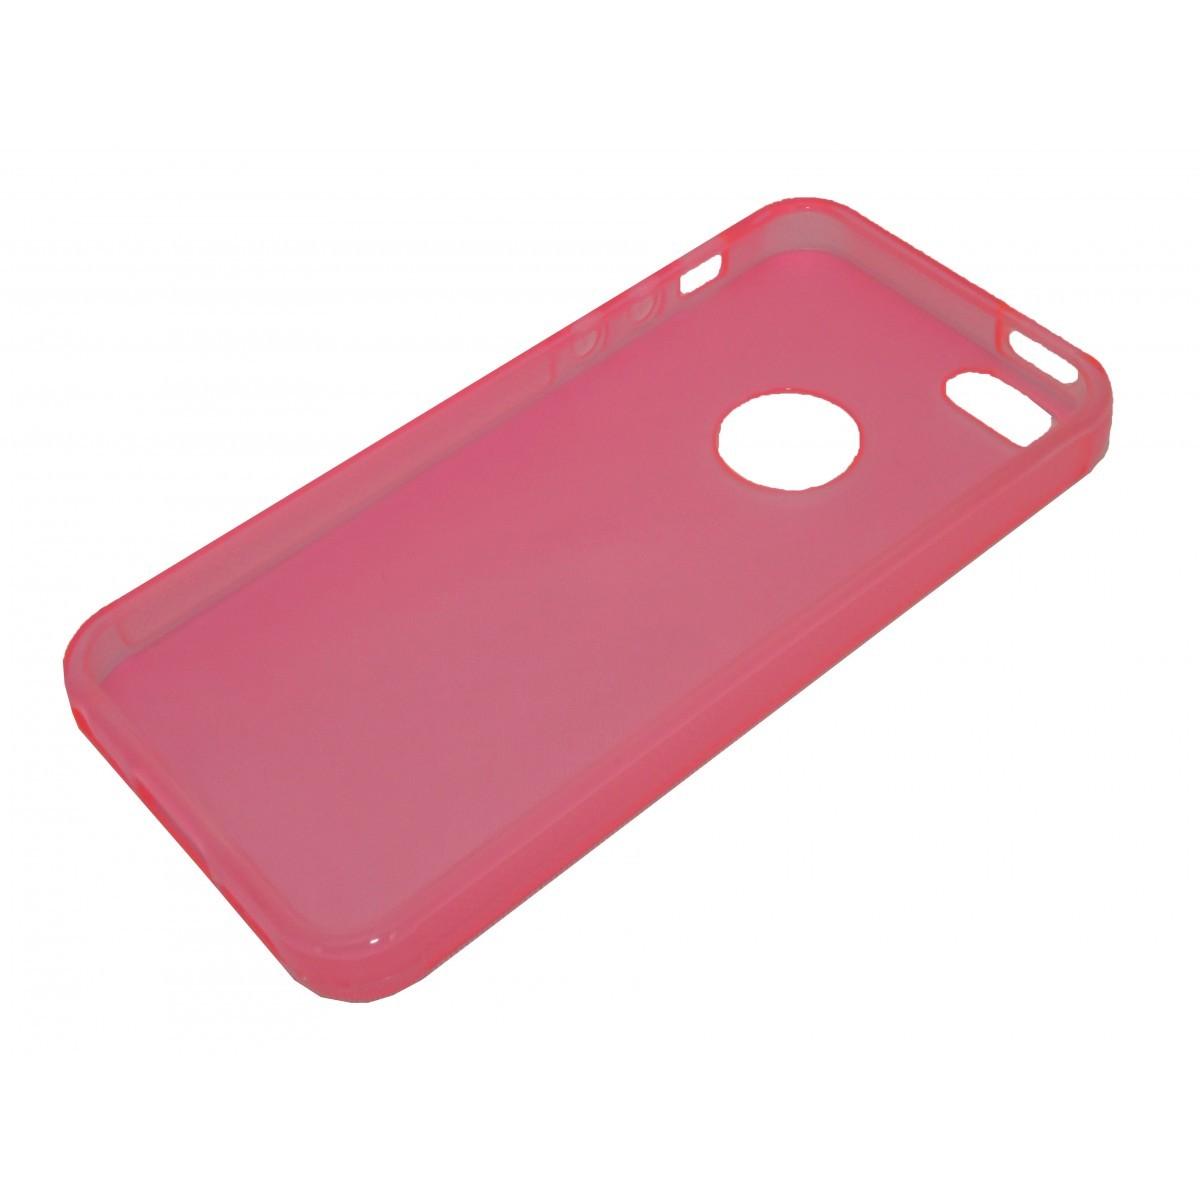 Capa de Tpu para Iphone 5 5G  Pelicula Rosa - Matecki